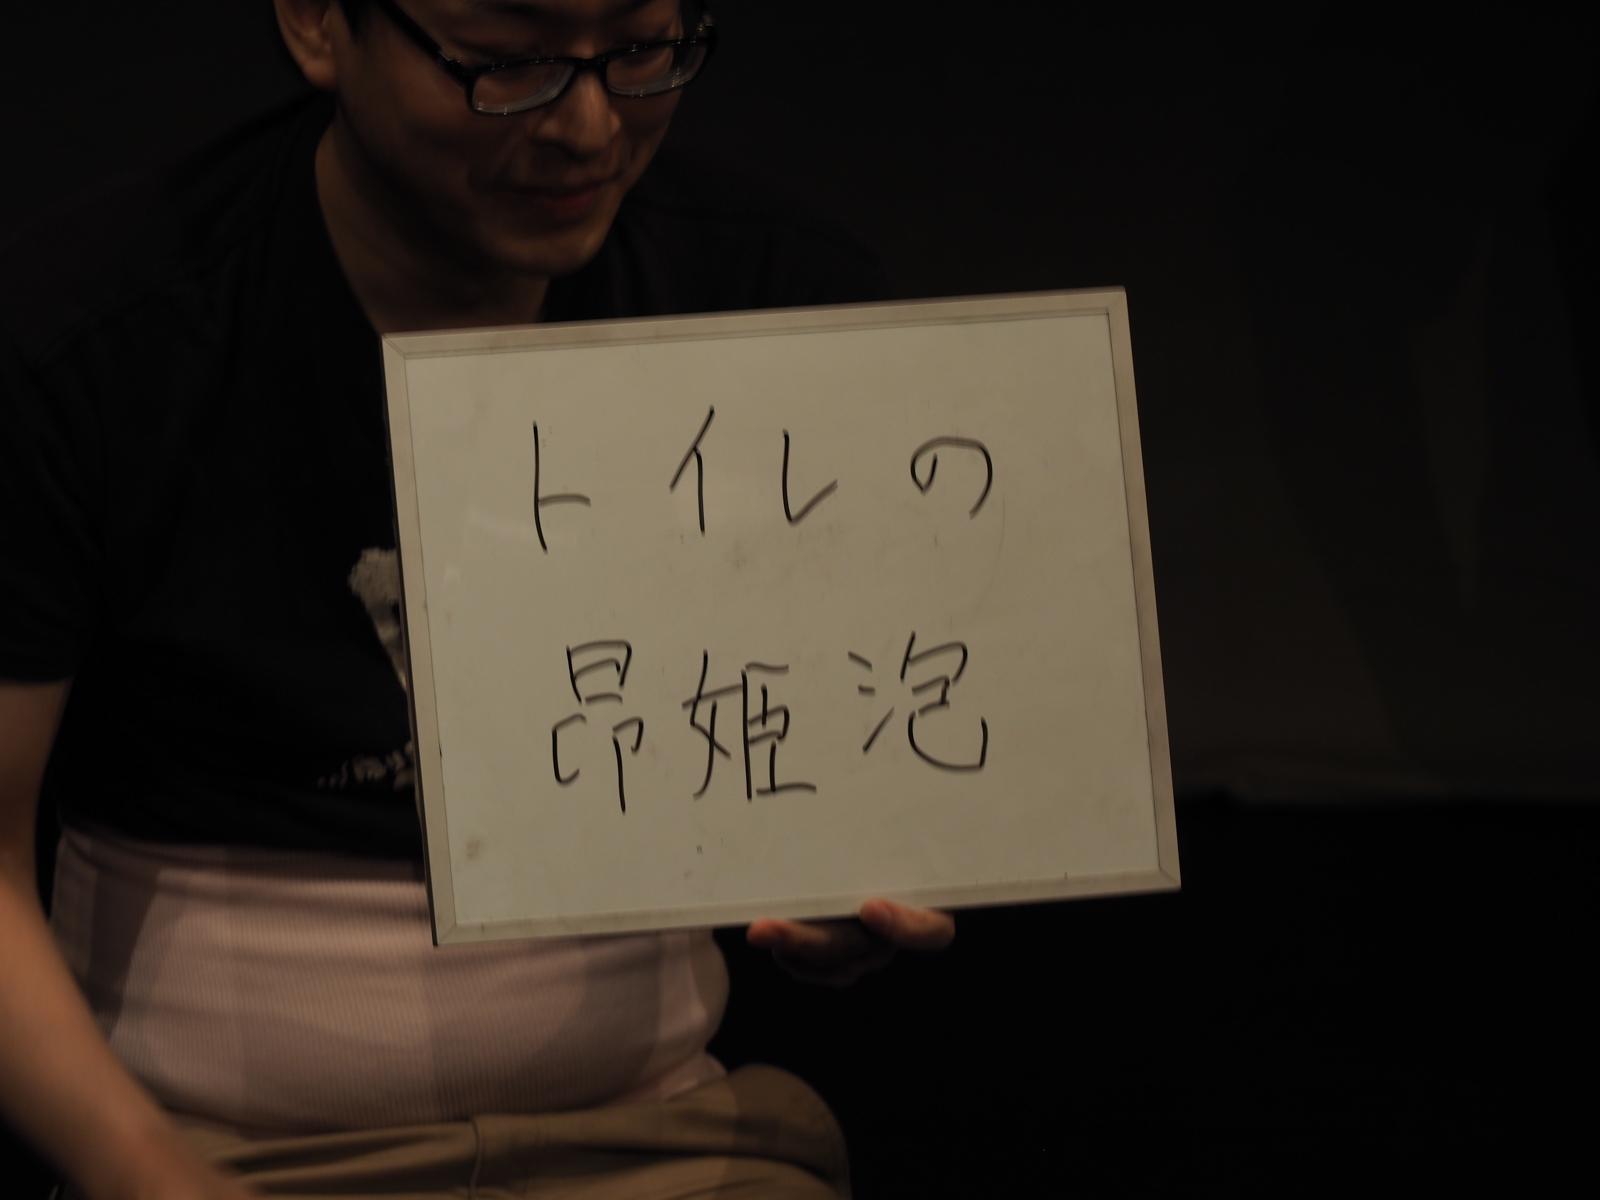 f:id:motomachi24:20170226182000j:plain